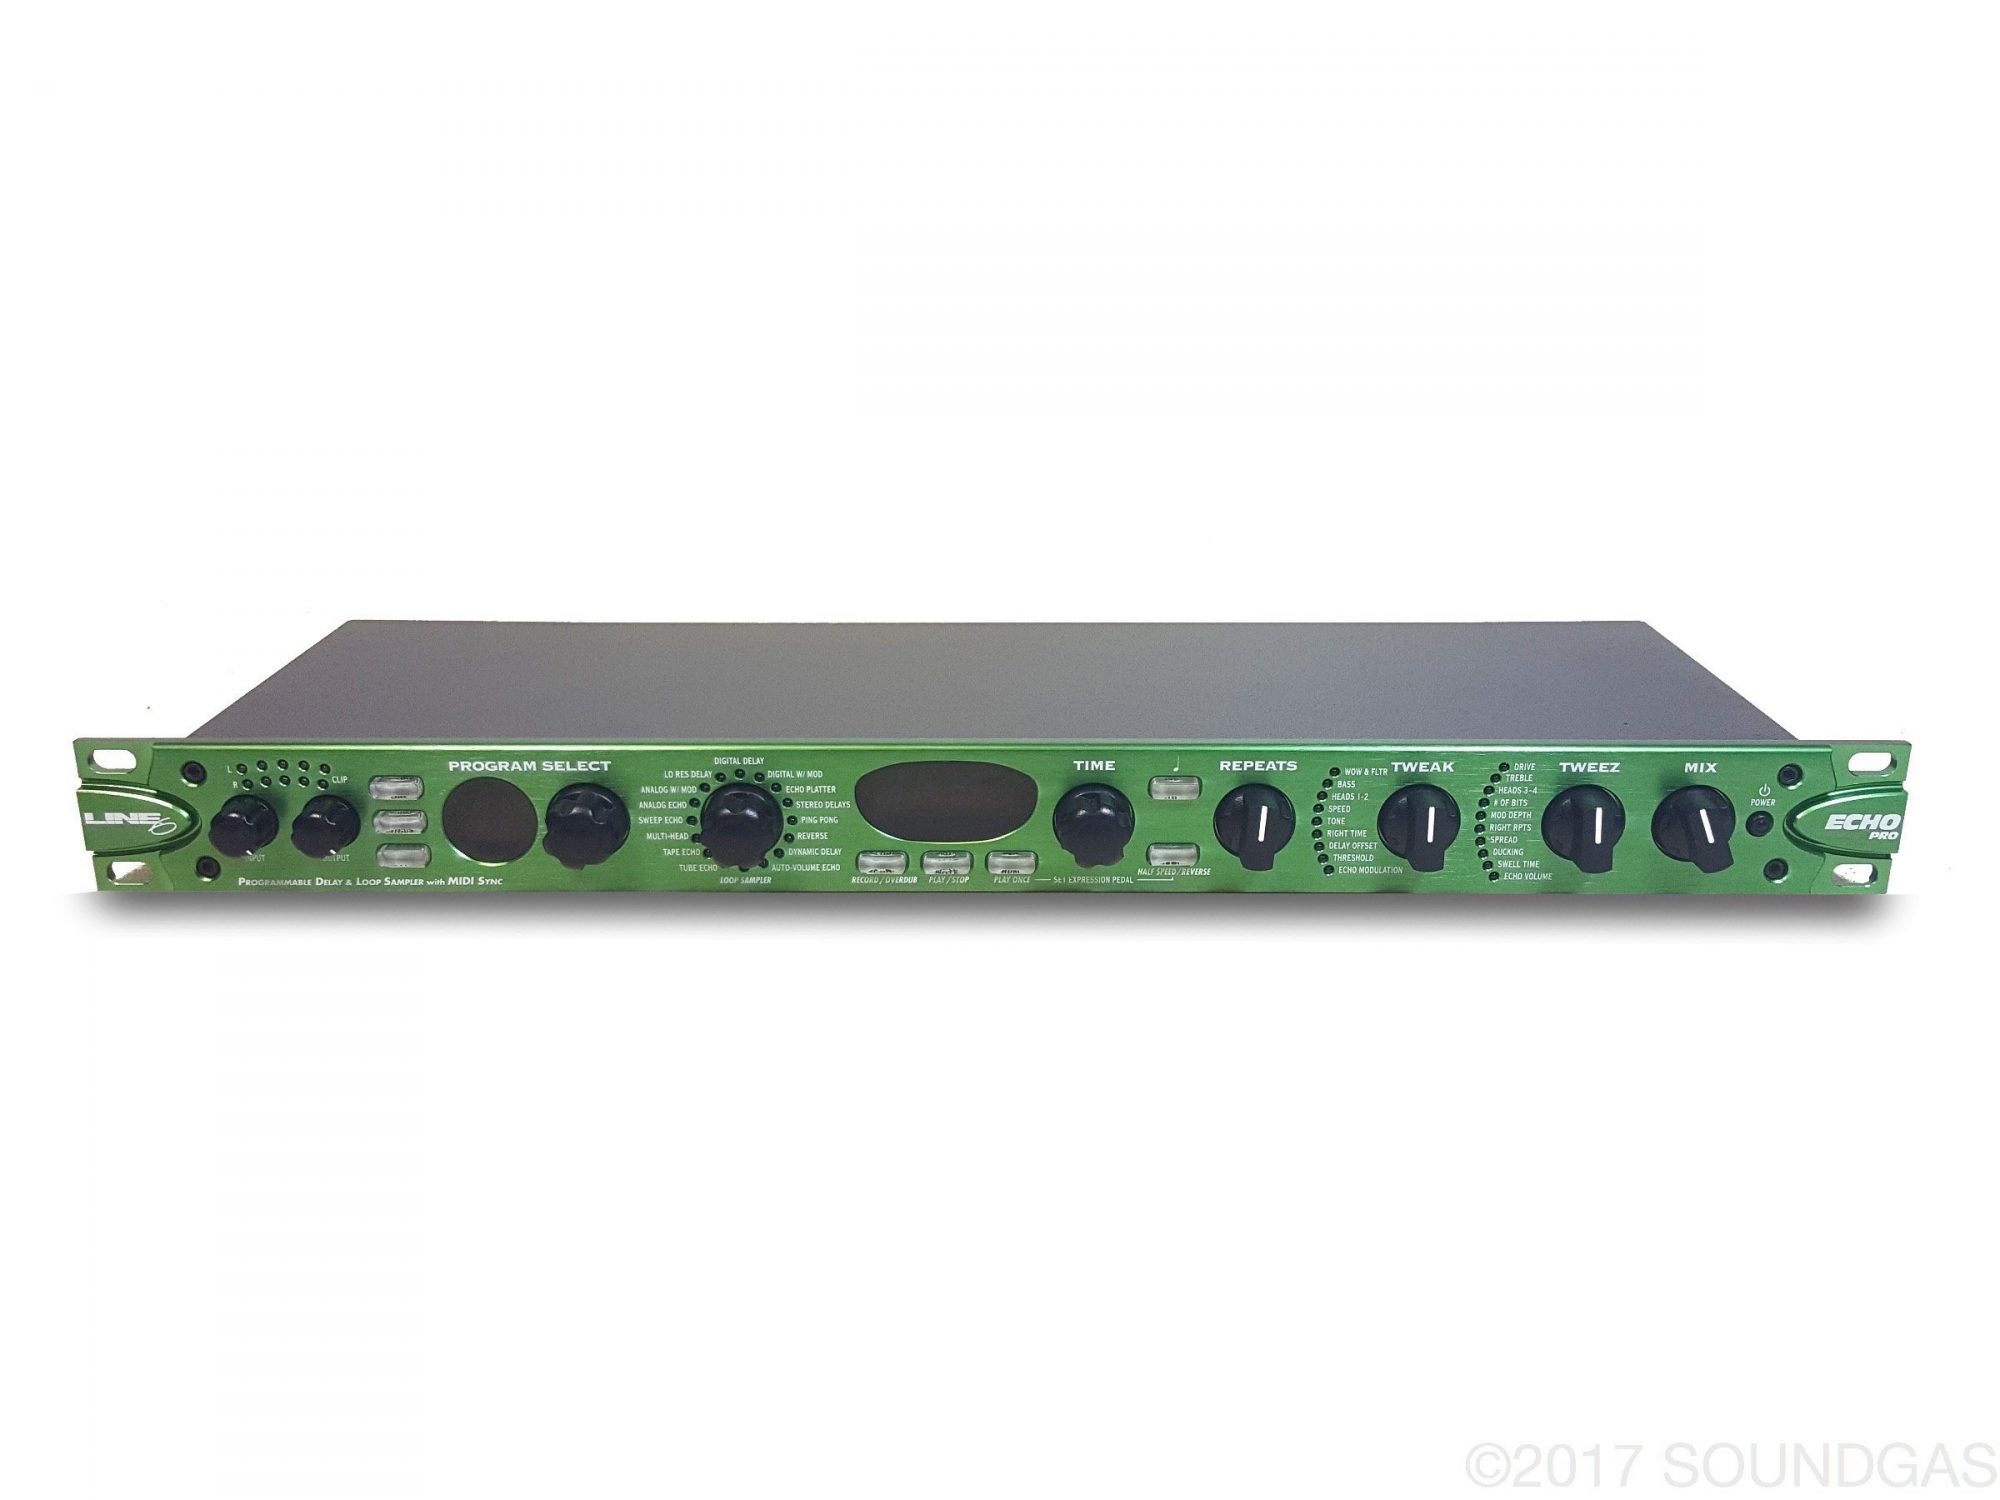 Line-6-Echo-Pro-Delay-Rack-Cover-3-2000×1500